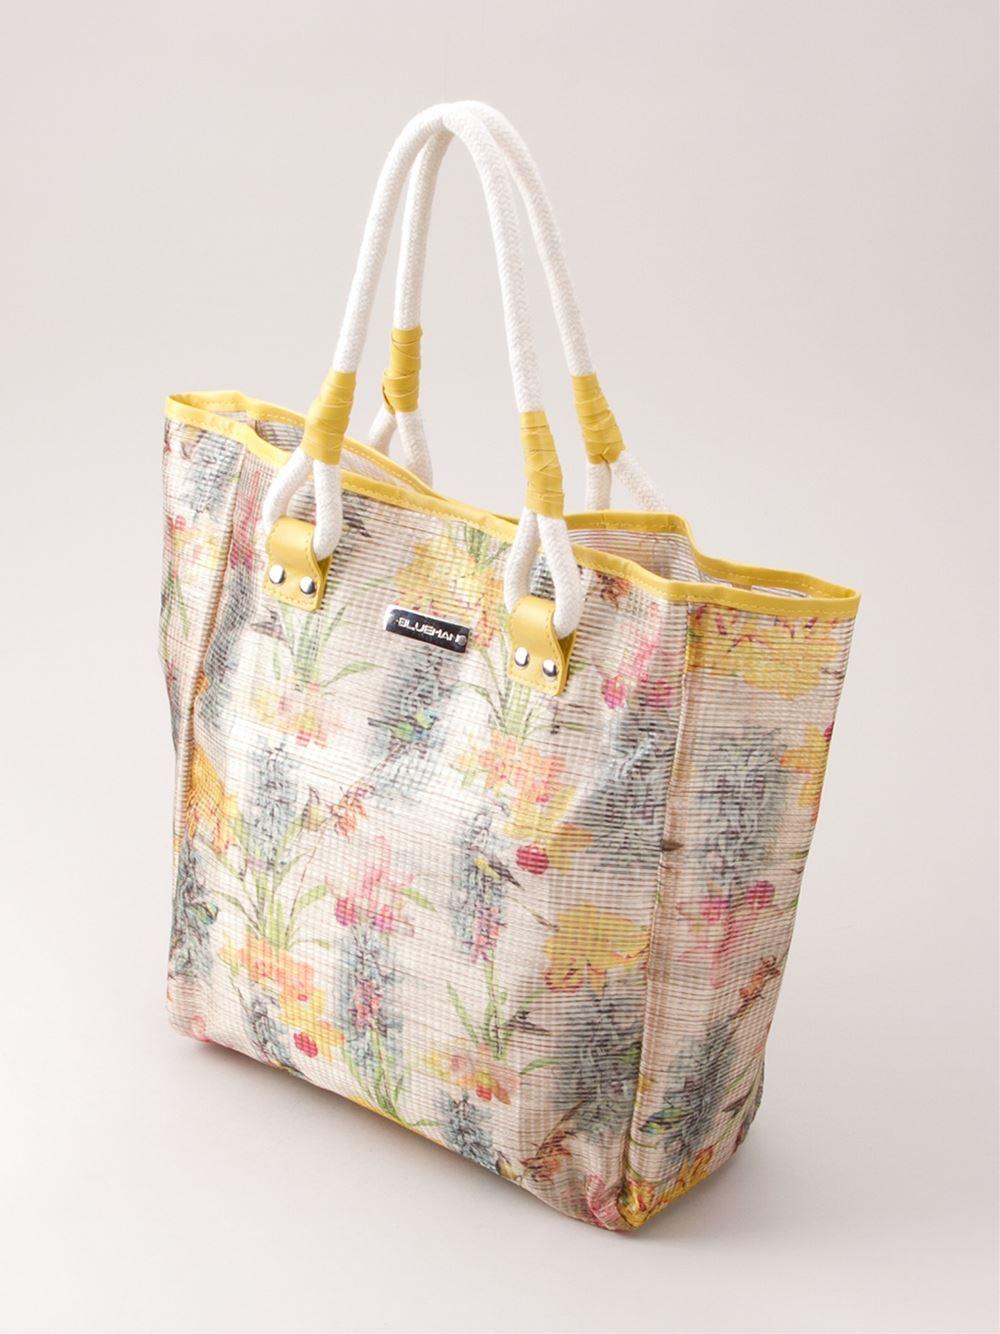 Lyst - Blue Man Floral Print Tote Bag In Natural